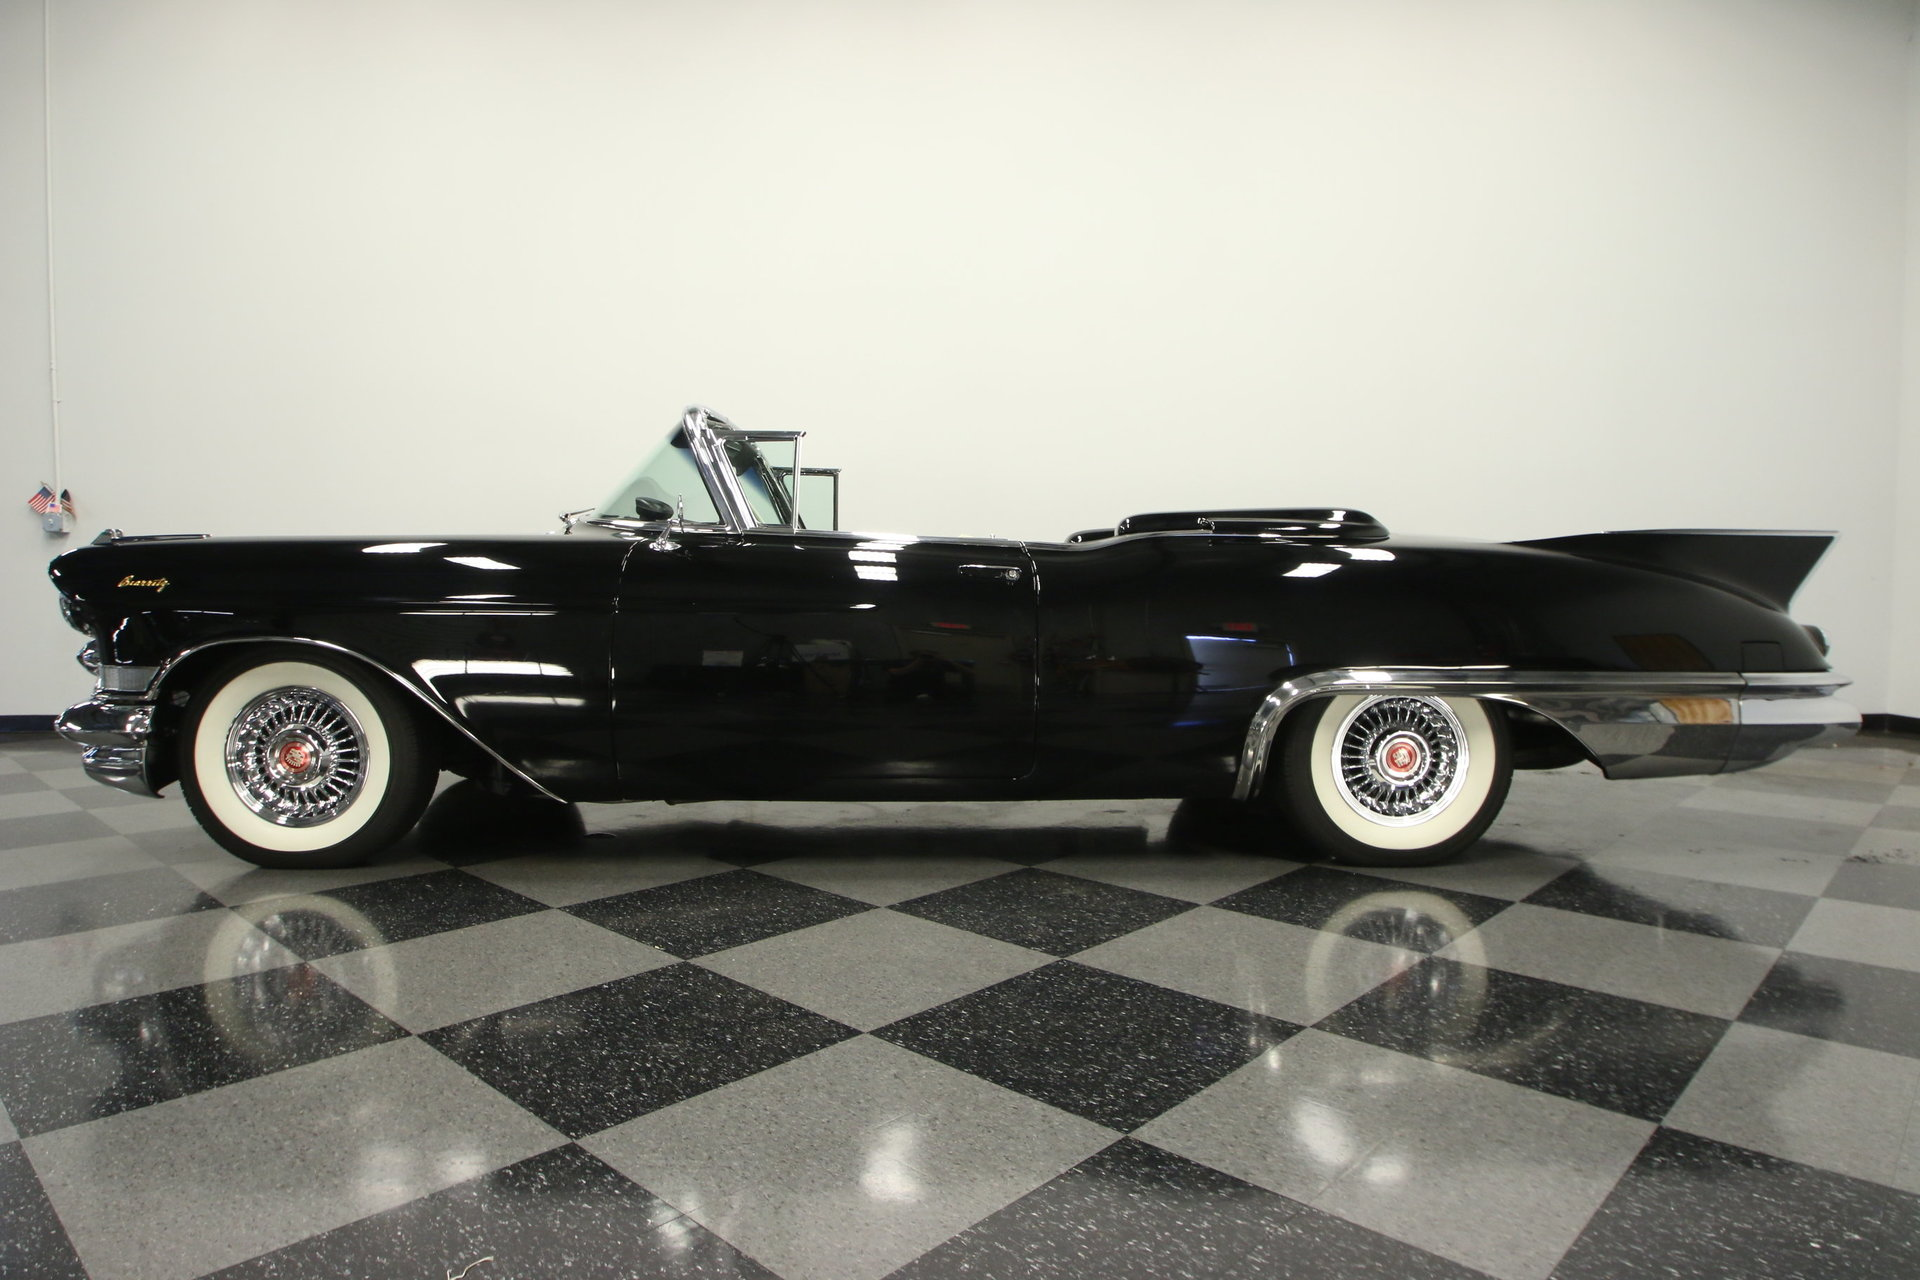 1957 Cadillac Eldorado Streetside Classics The Nations Trusted 57 Biarritz Show More Photos